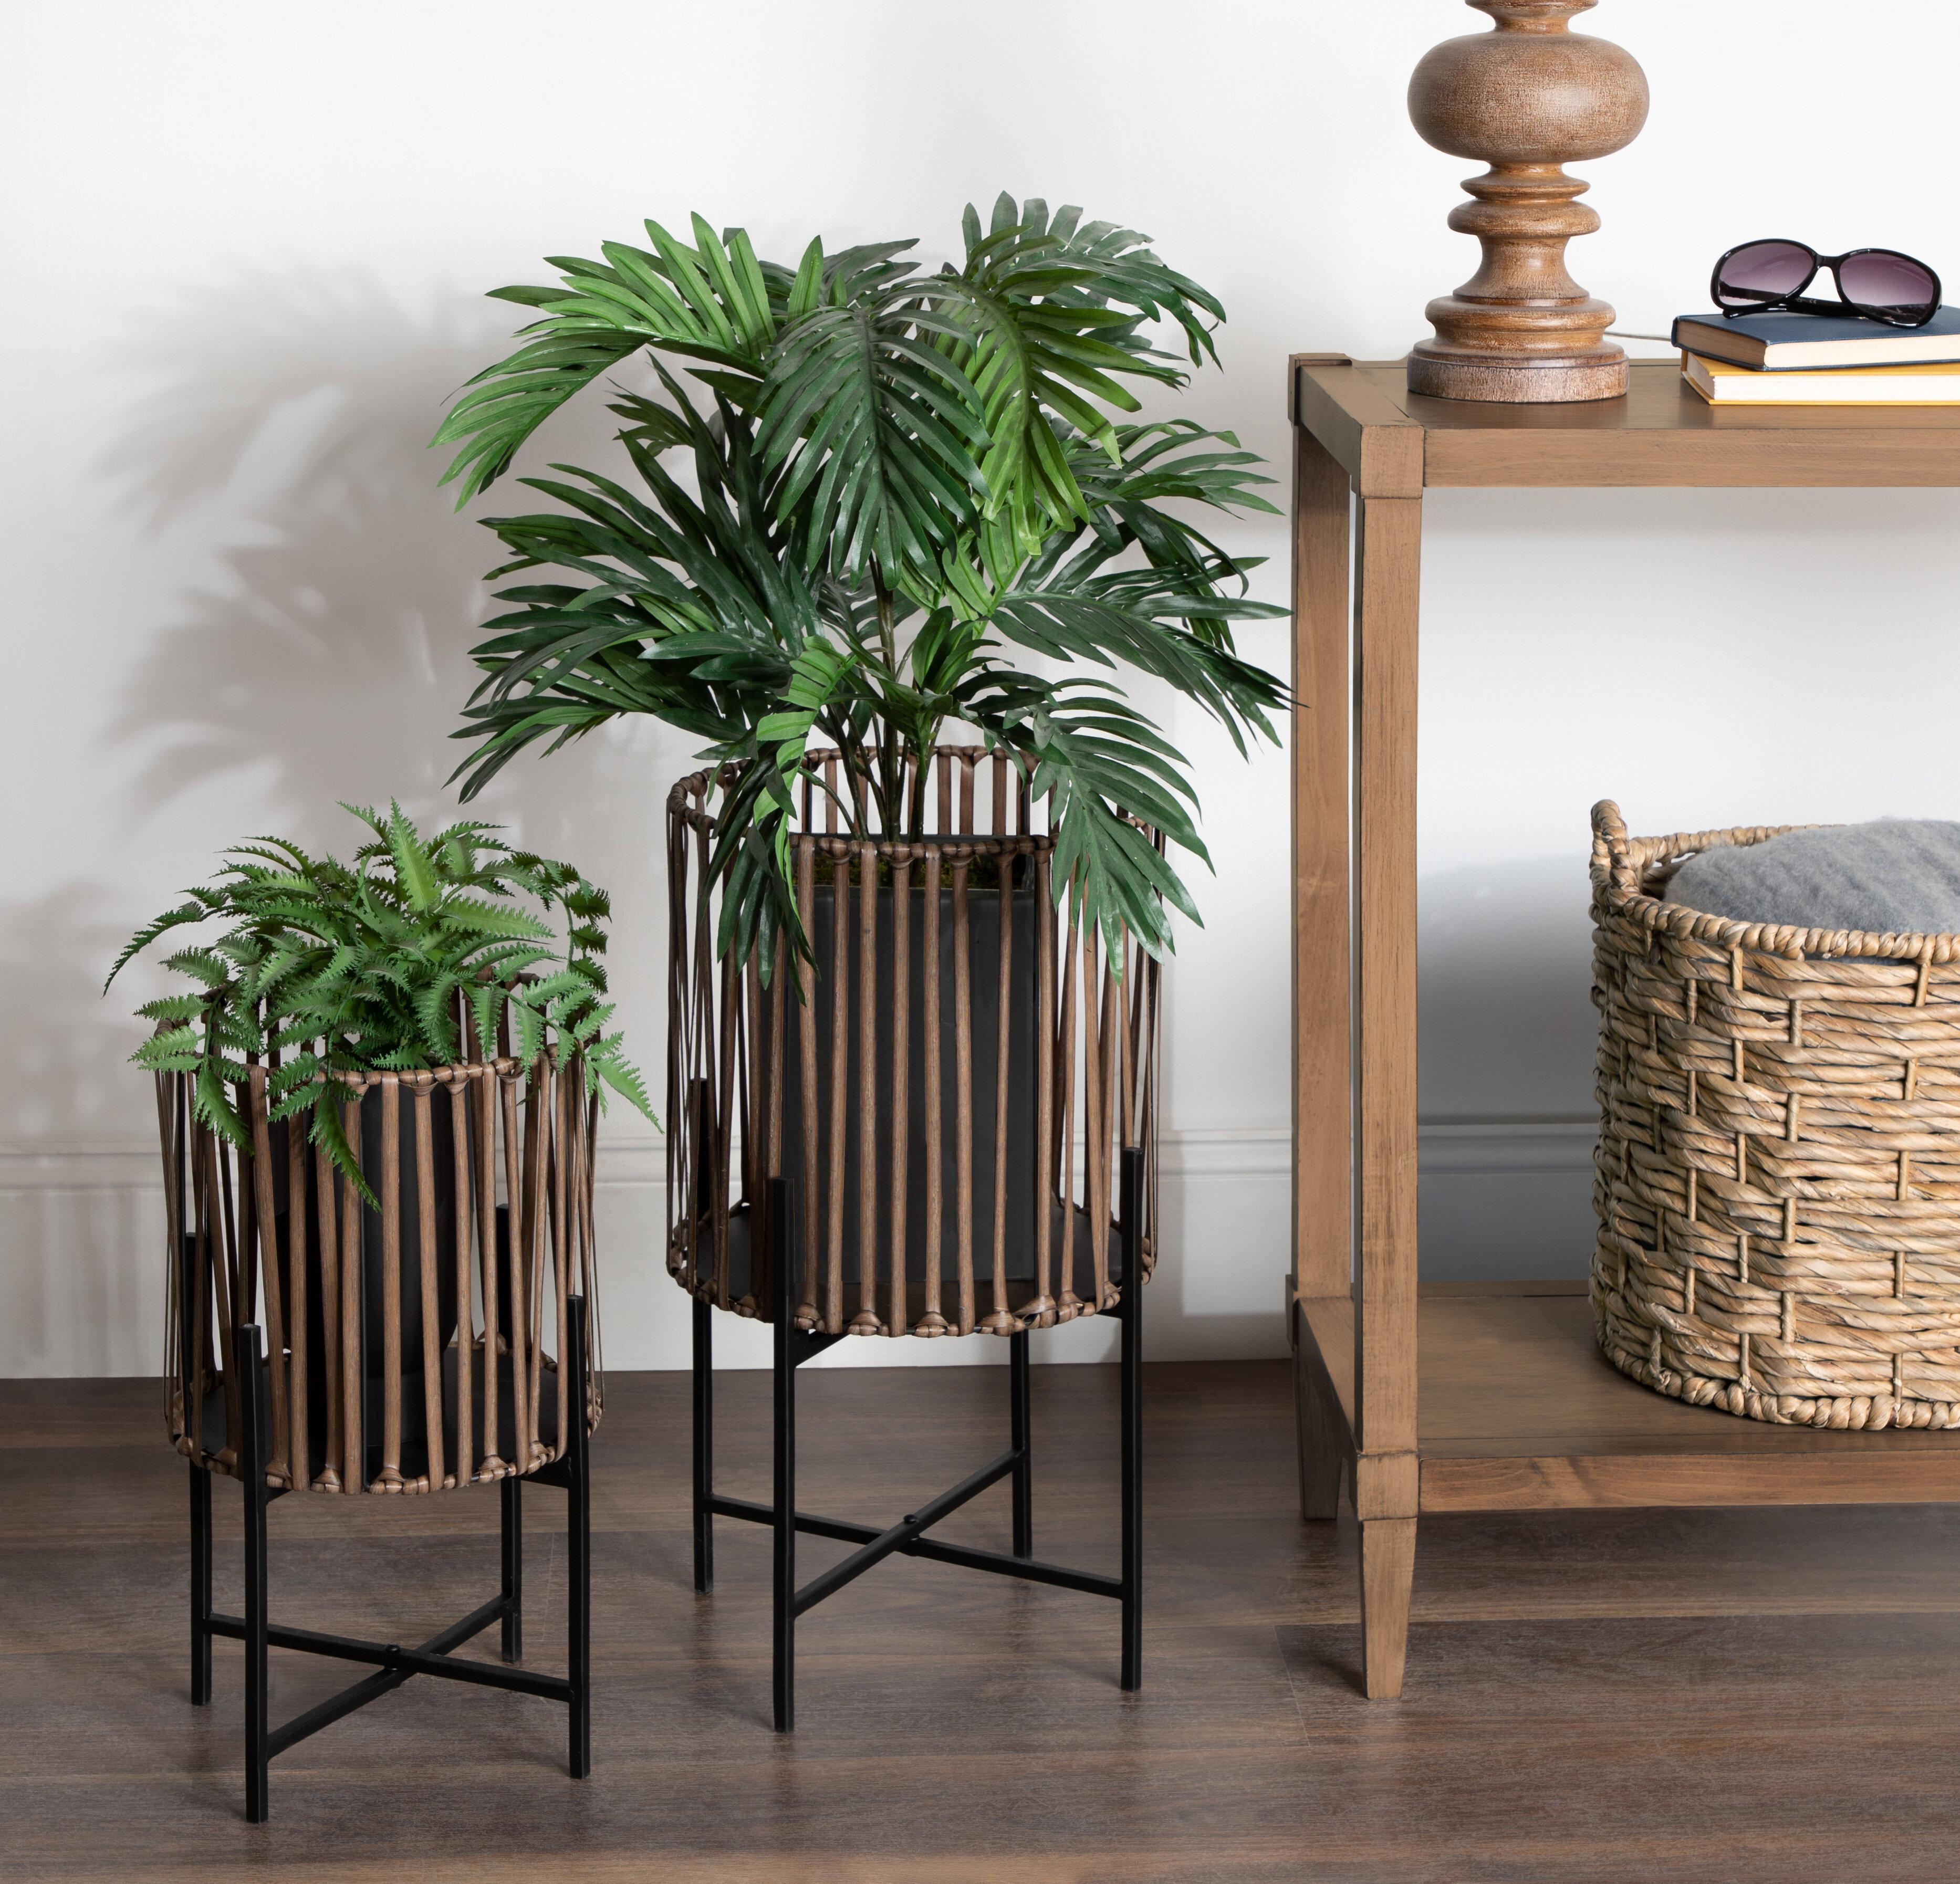 Allmodern Jakobe Floor 2 Piece Pot Planter Set With Pvc Wicker And Metal Stands Reviews Wayfair Ca